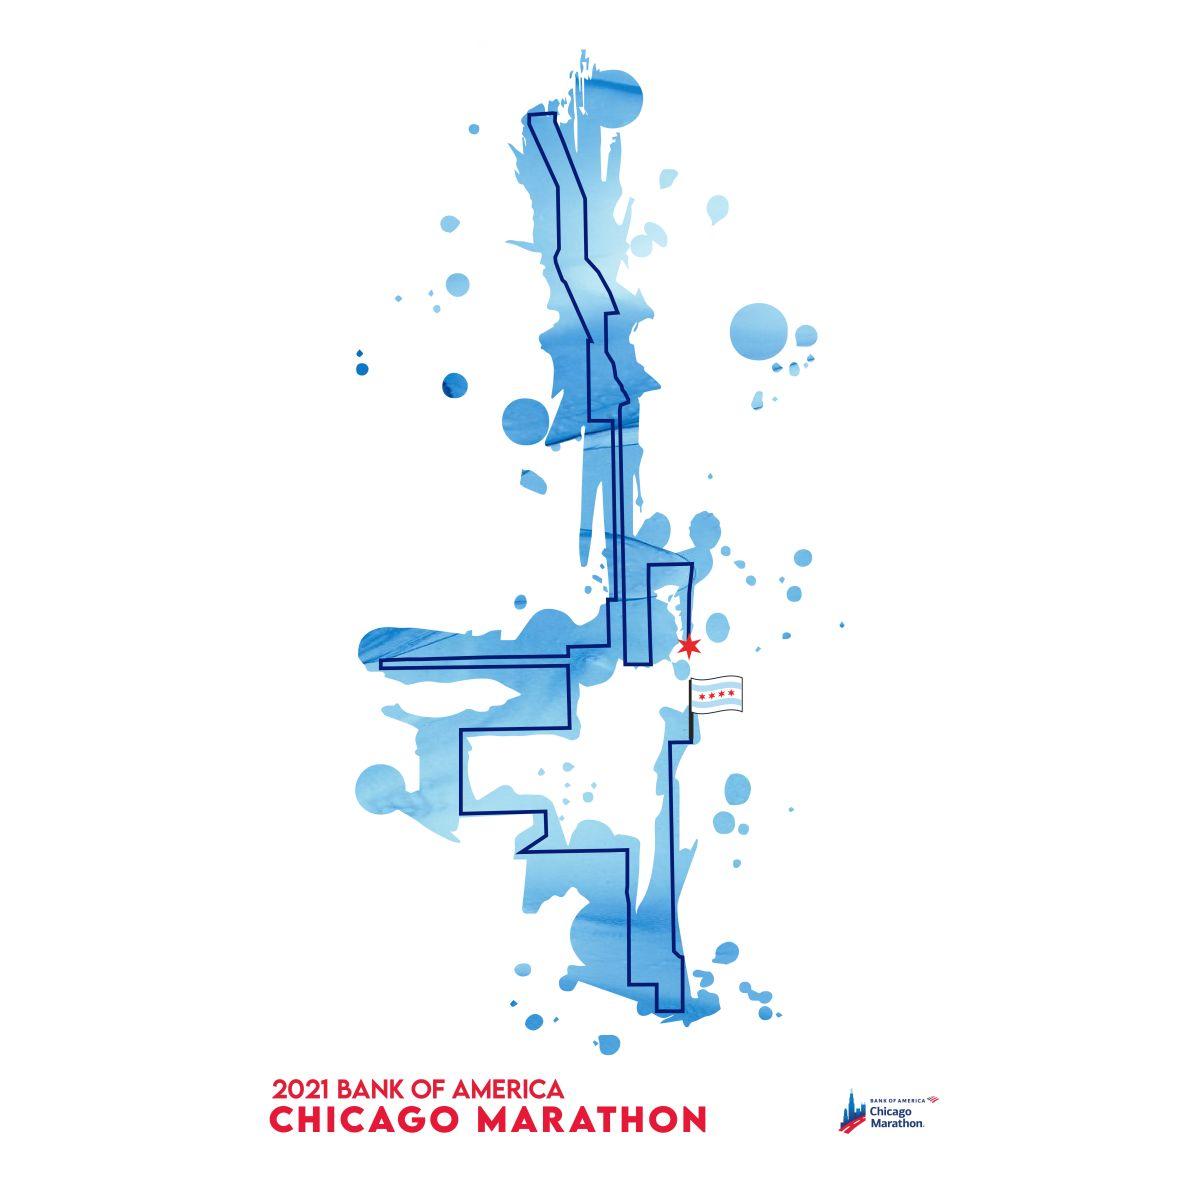 2021 Bank of America Chicago Marathon Map